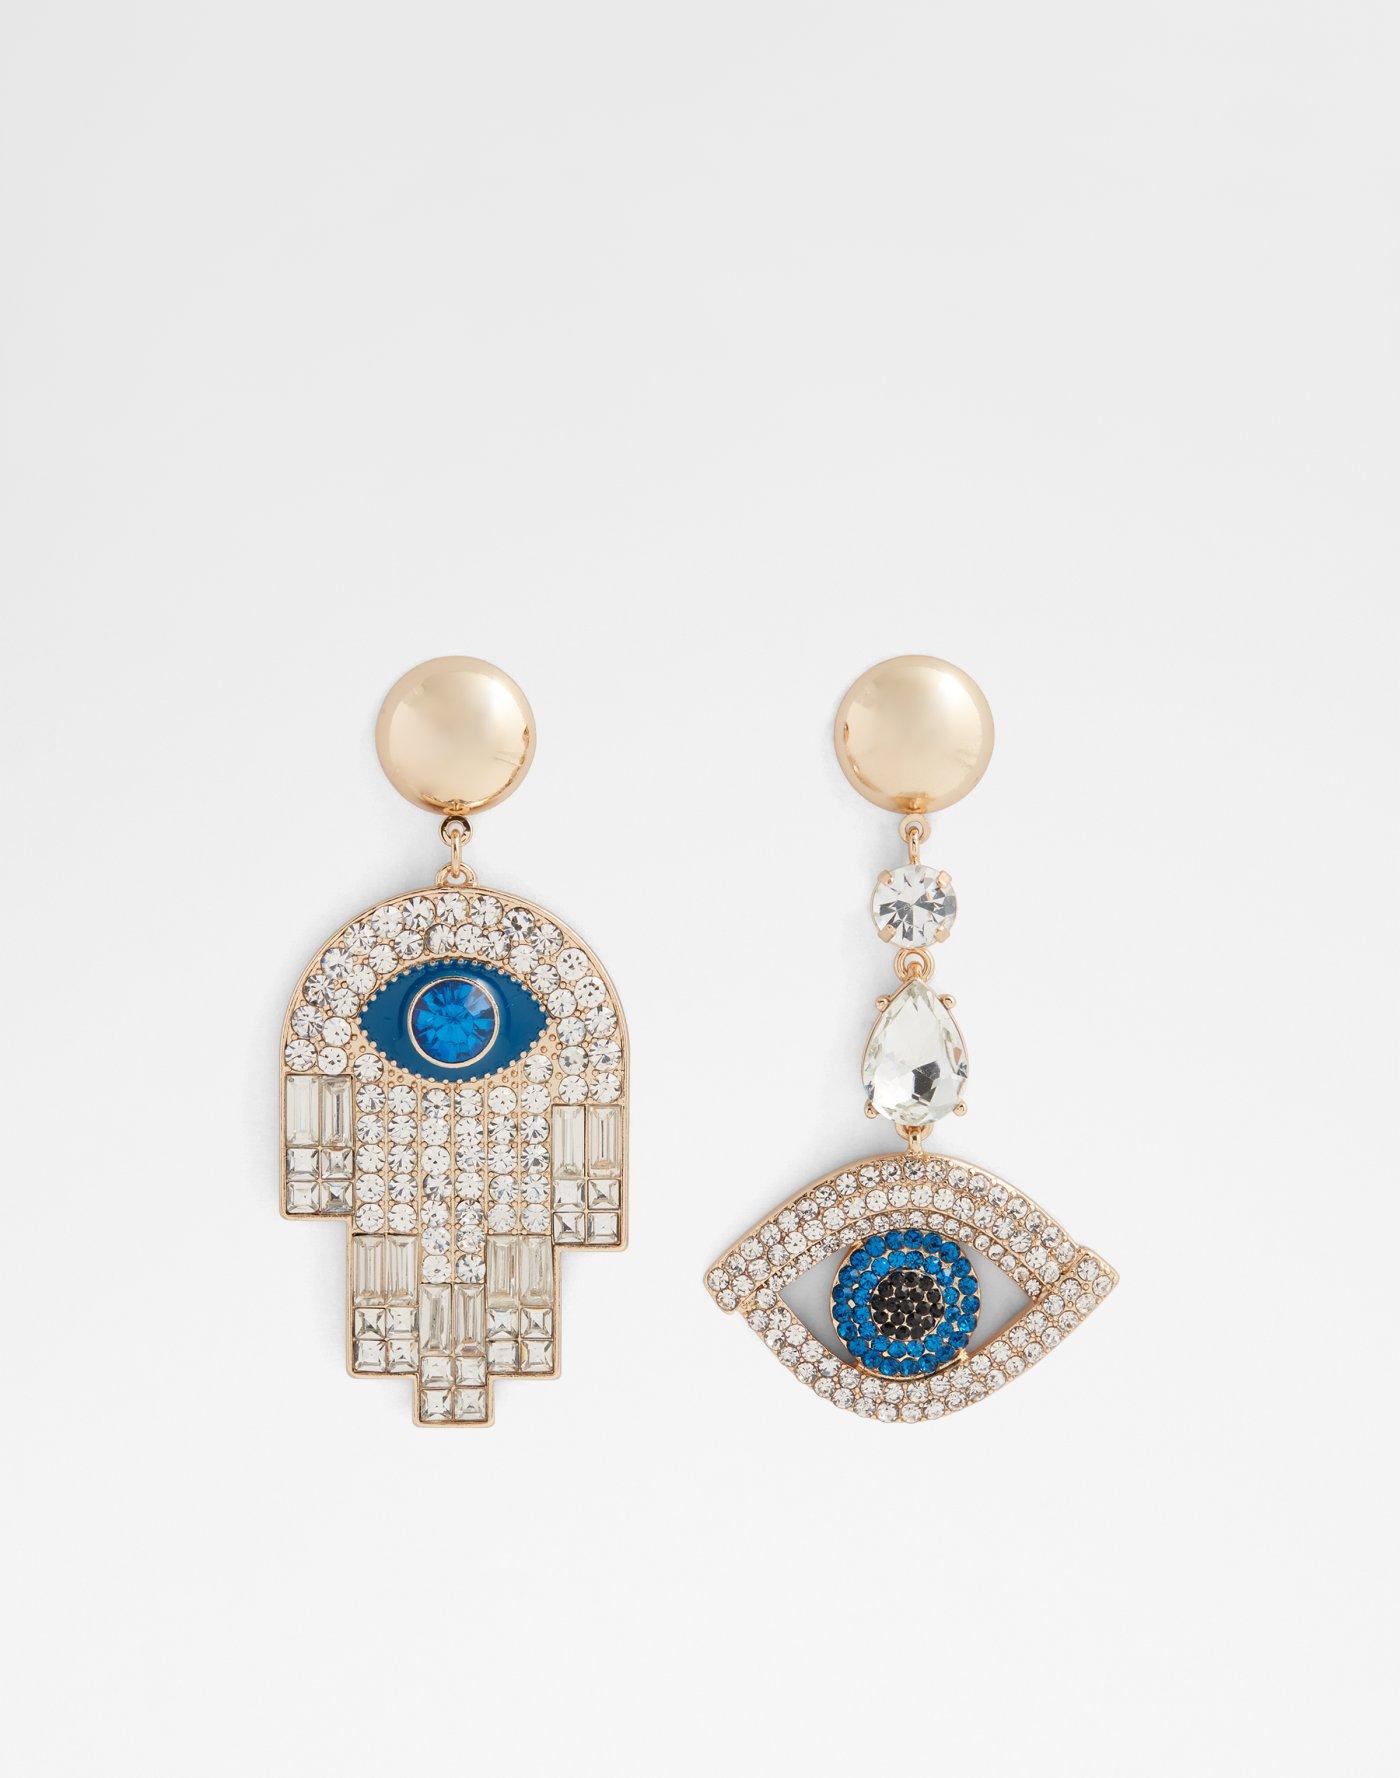 4a76595dee8 Earrings | Aldoshoes.com US